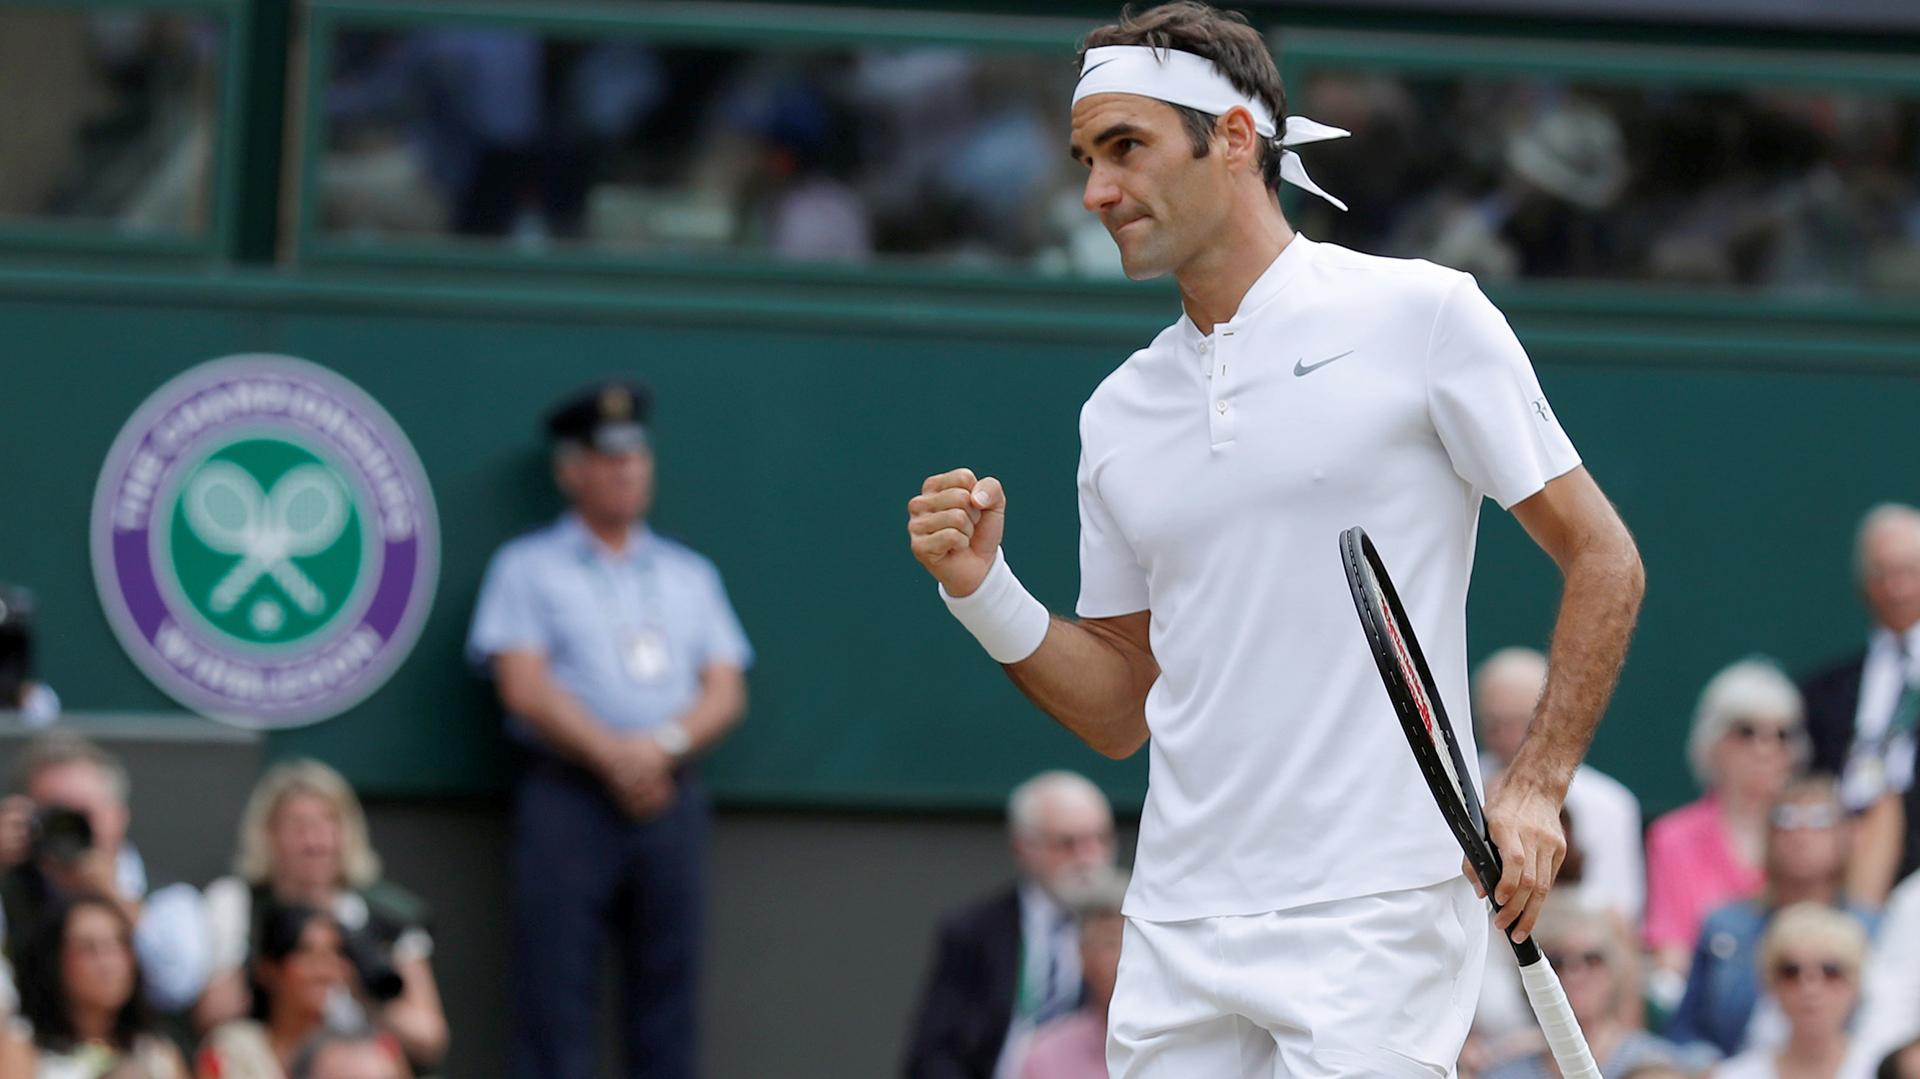 Roger Federer, en Wimbledon, pero como en el jardín de su casa (Reuters)